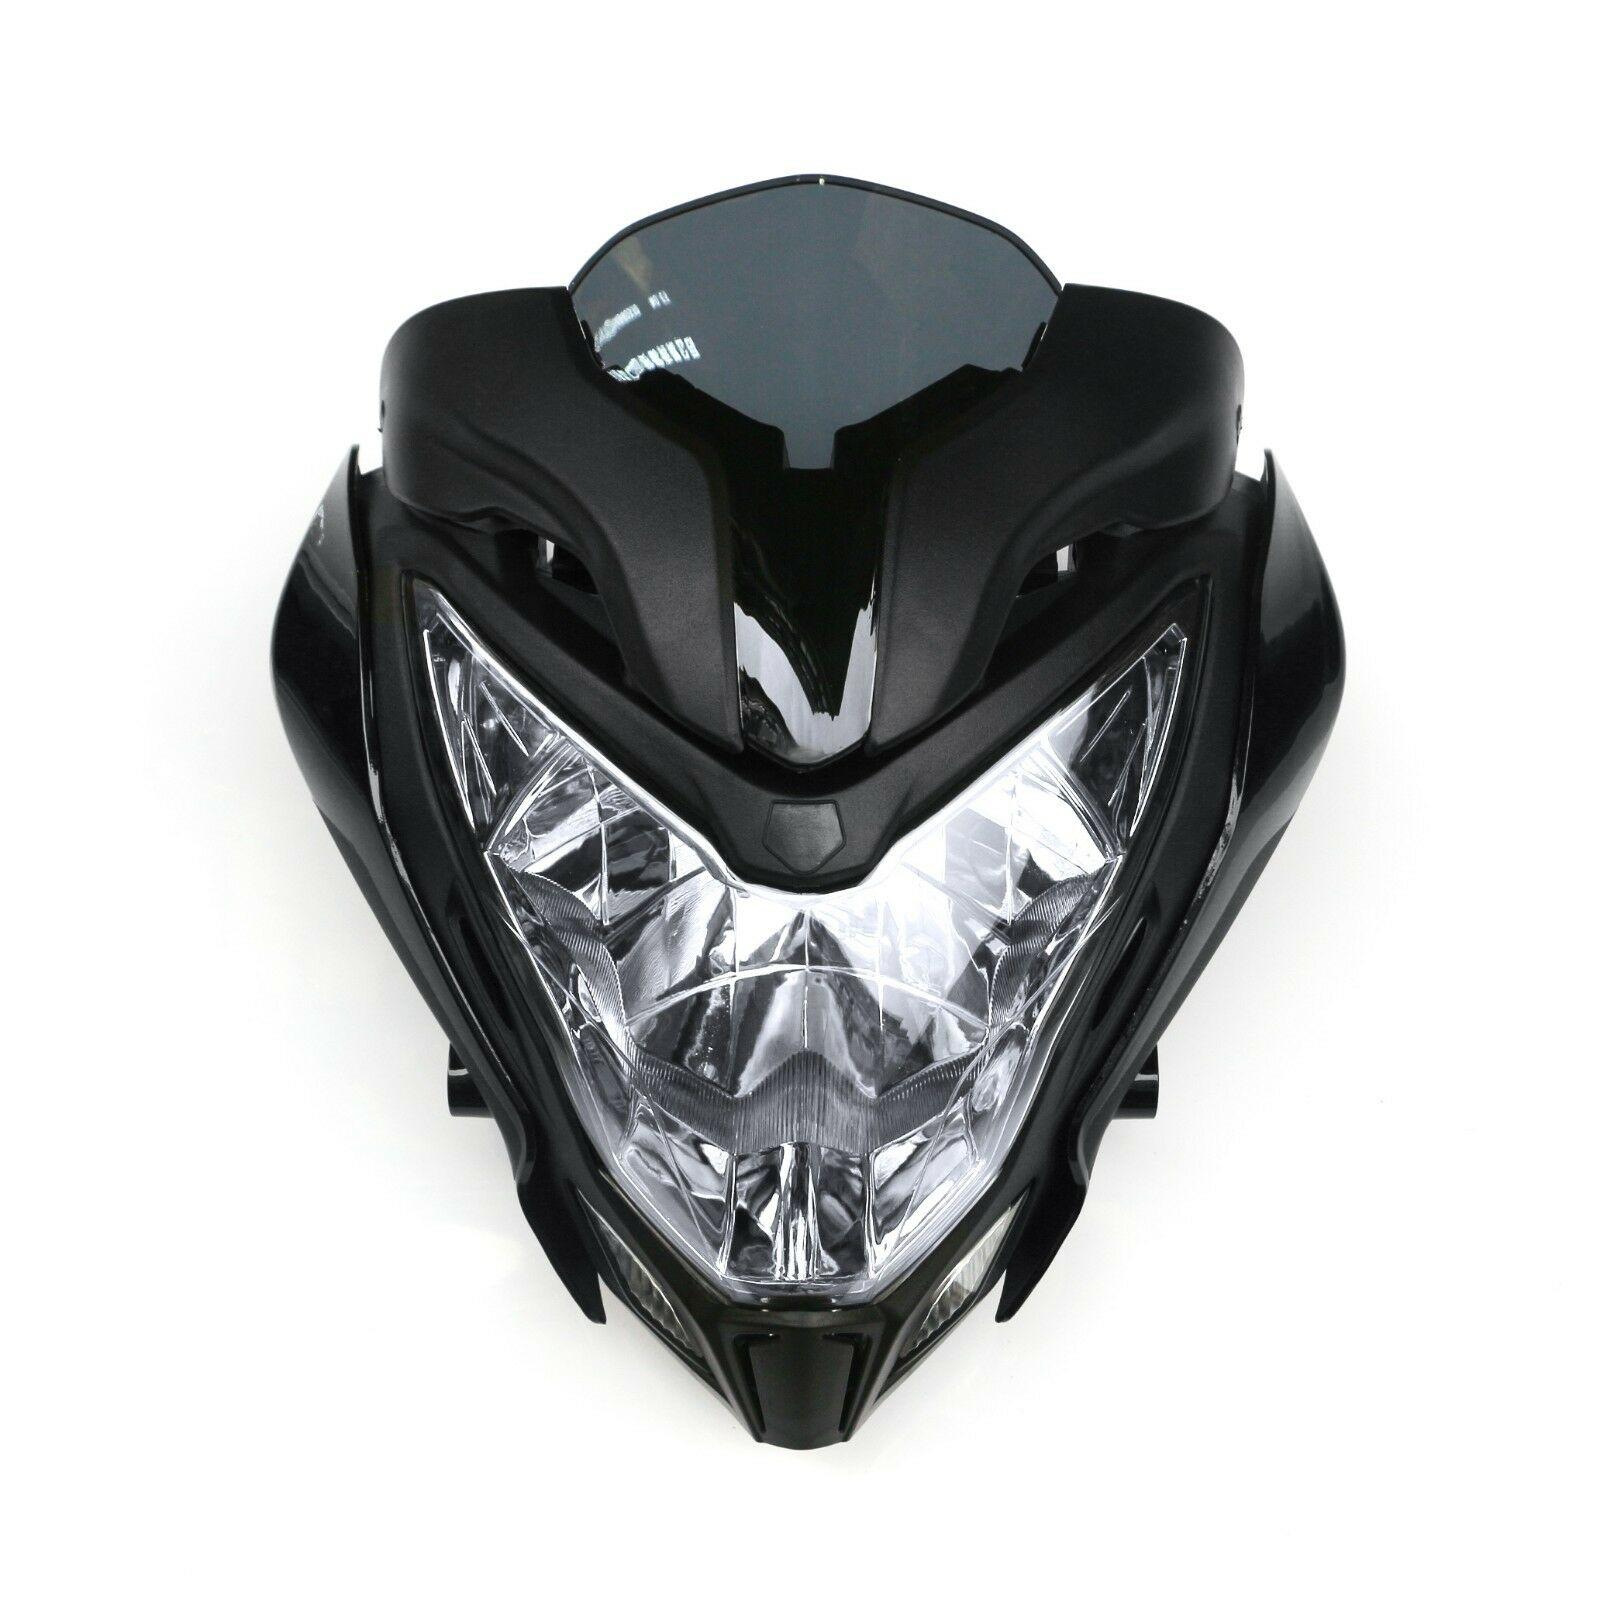 Motorcycle HeadLight Assembly Headlamp+Fairing Black Fit For BAJAJ PULSAR150 200